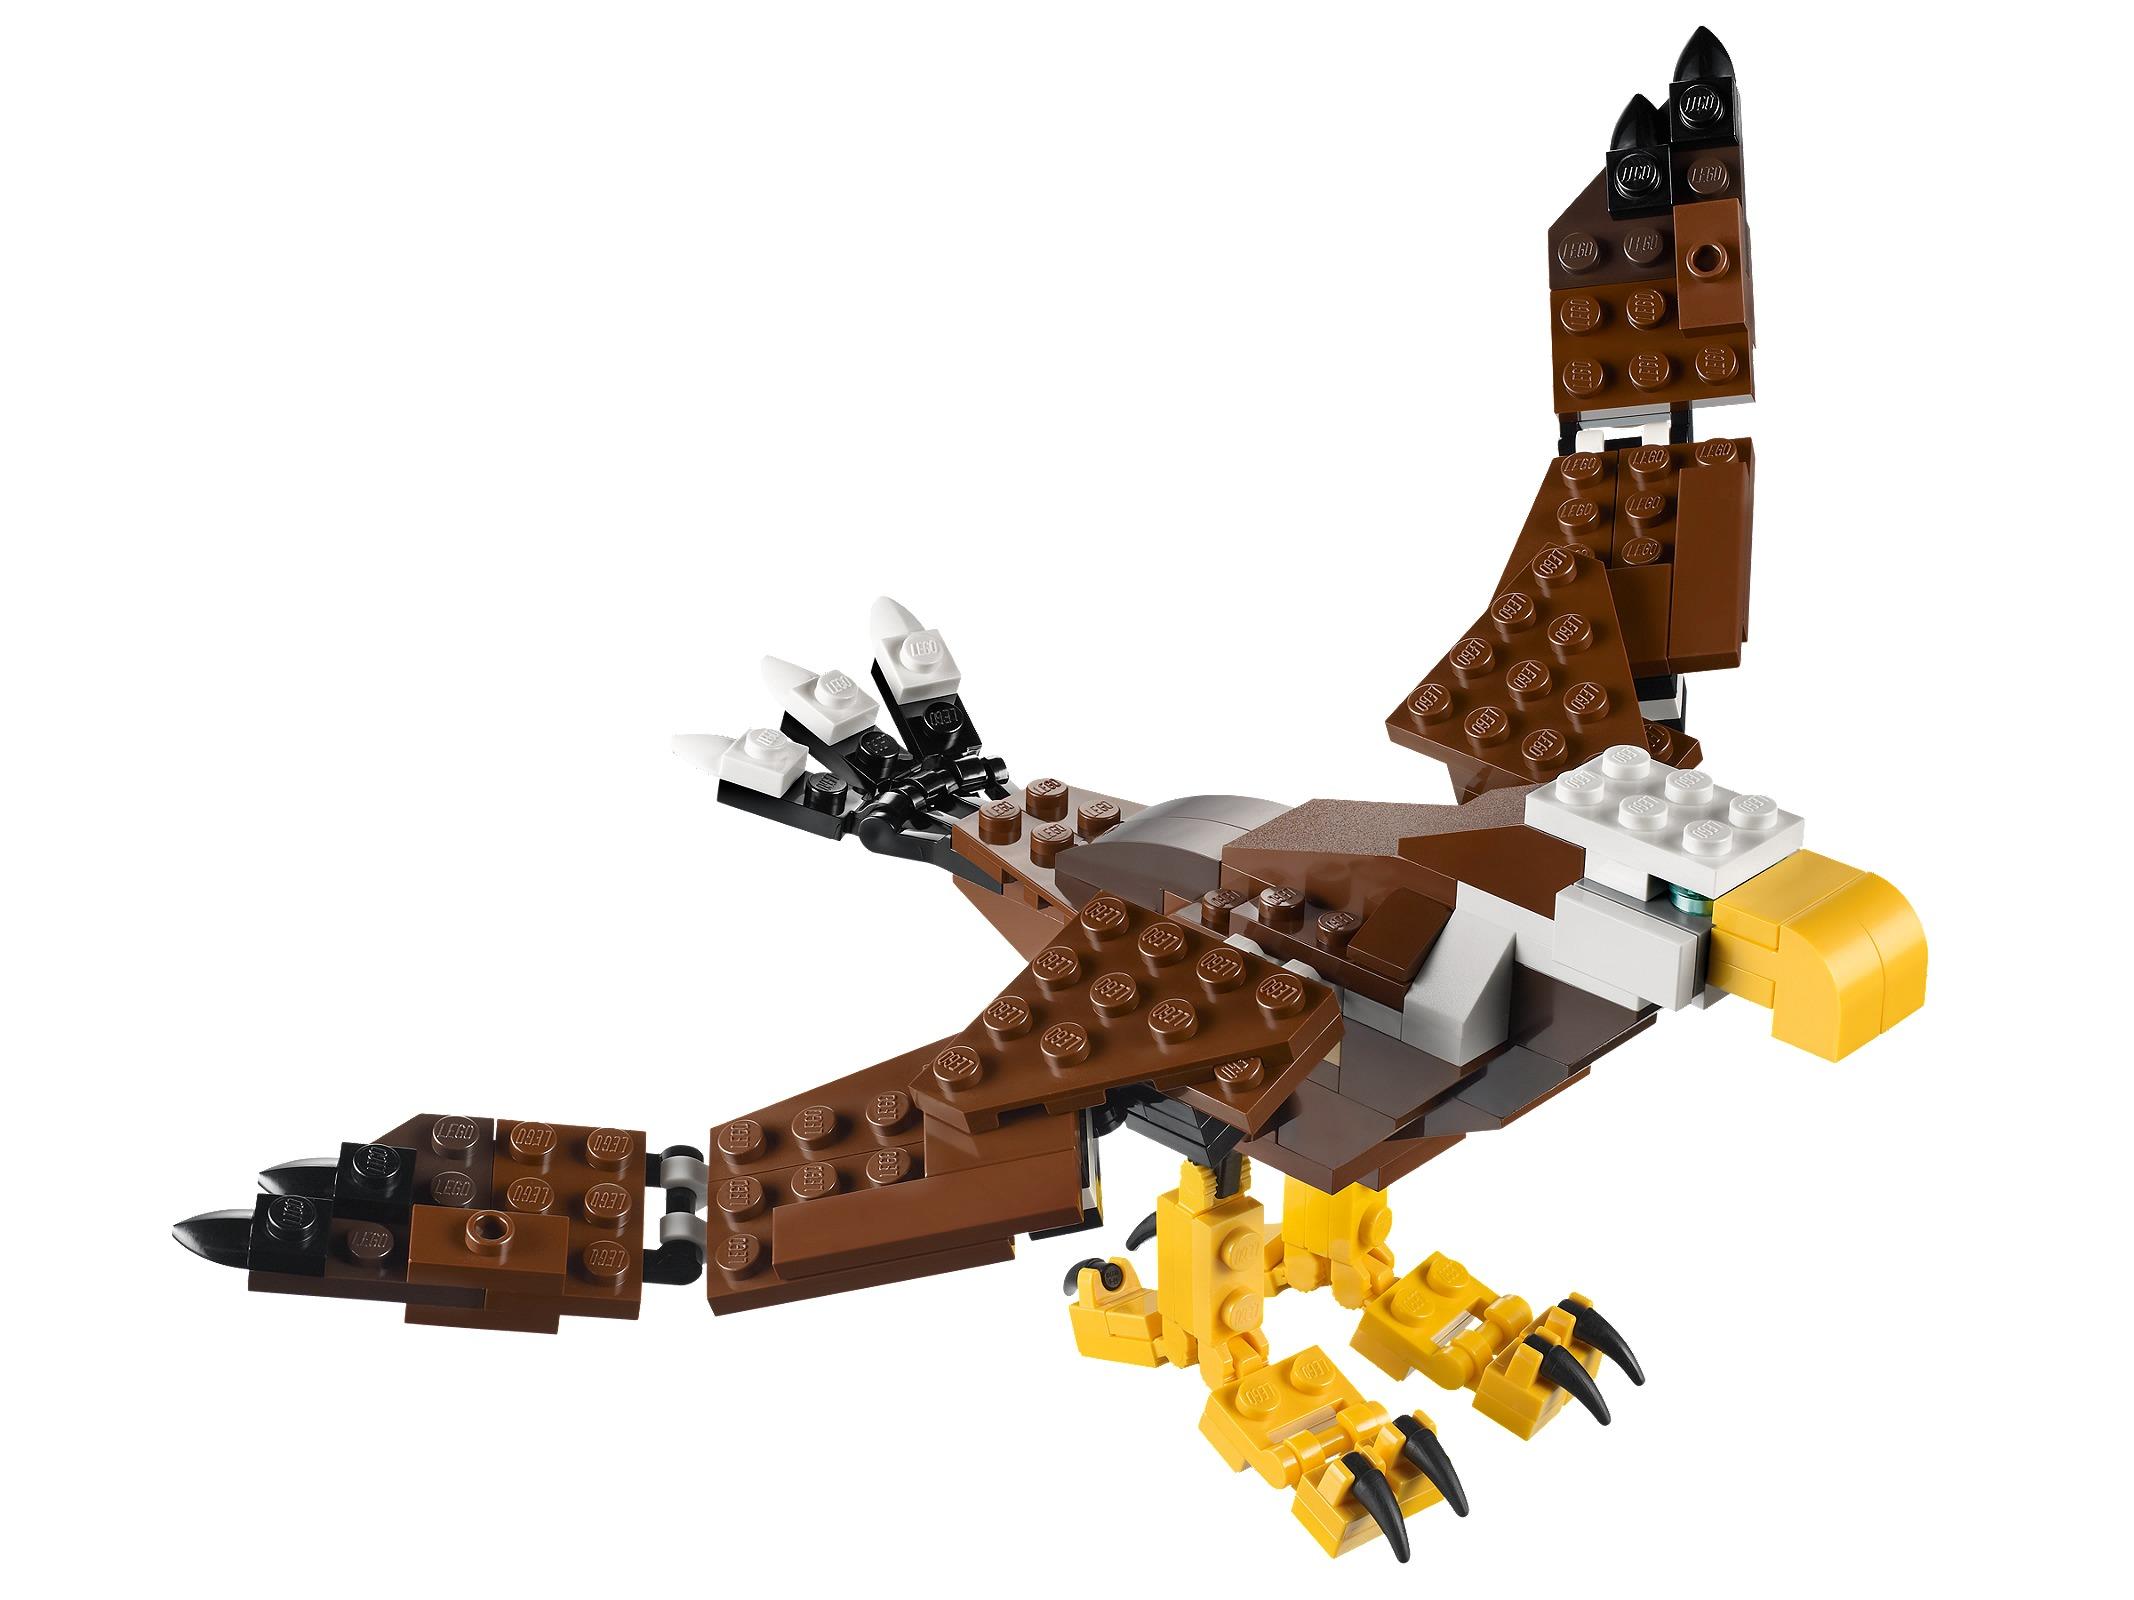 Moc Alternate Build Competition December Rebrickable Build